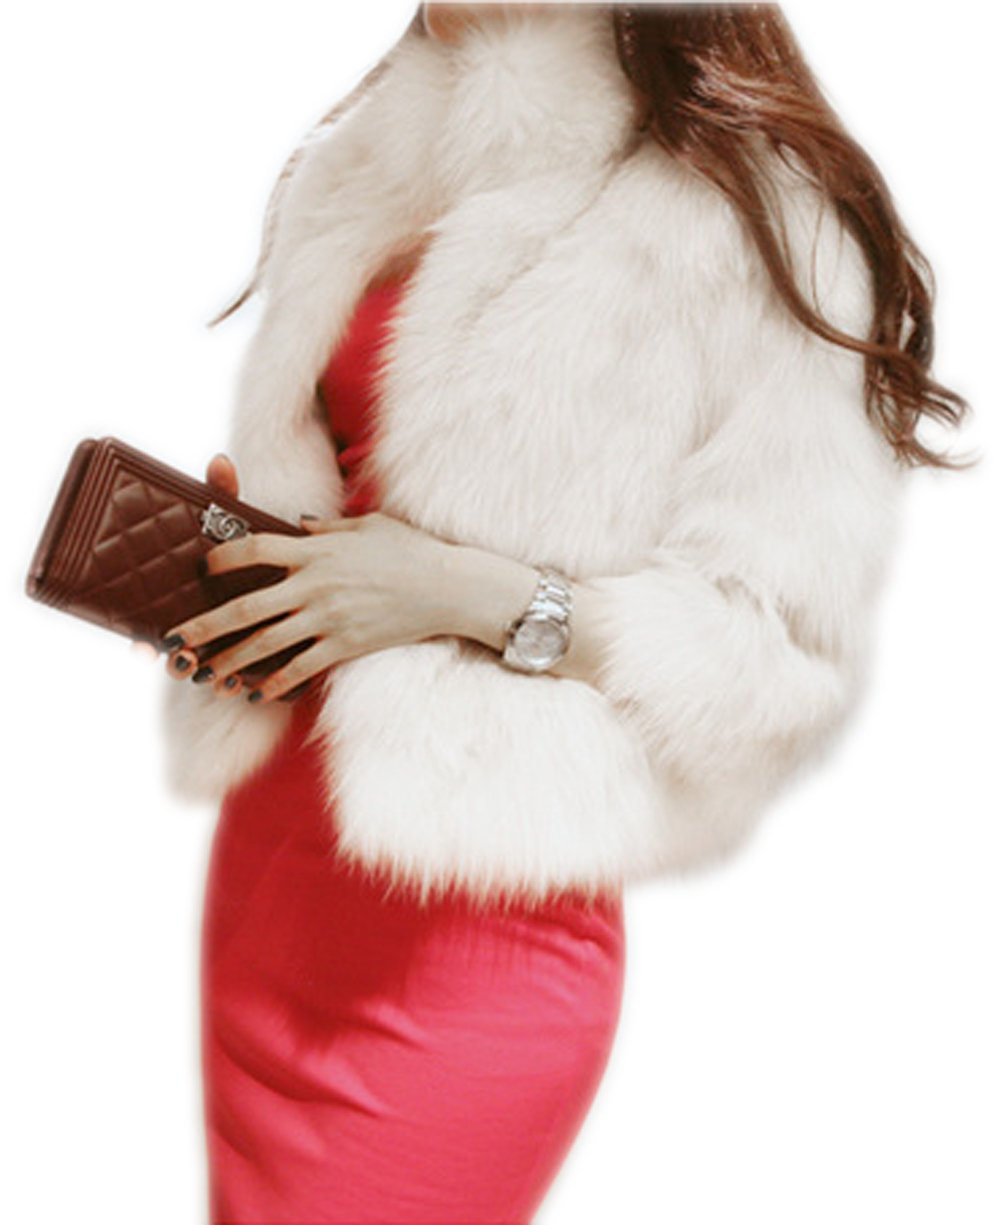 Women's Elegant Short Faux Fur Coat Winter Warm Fur Jacket Overcoat Outerwear, White, US 8-10/Tag 2XL